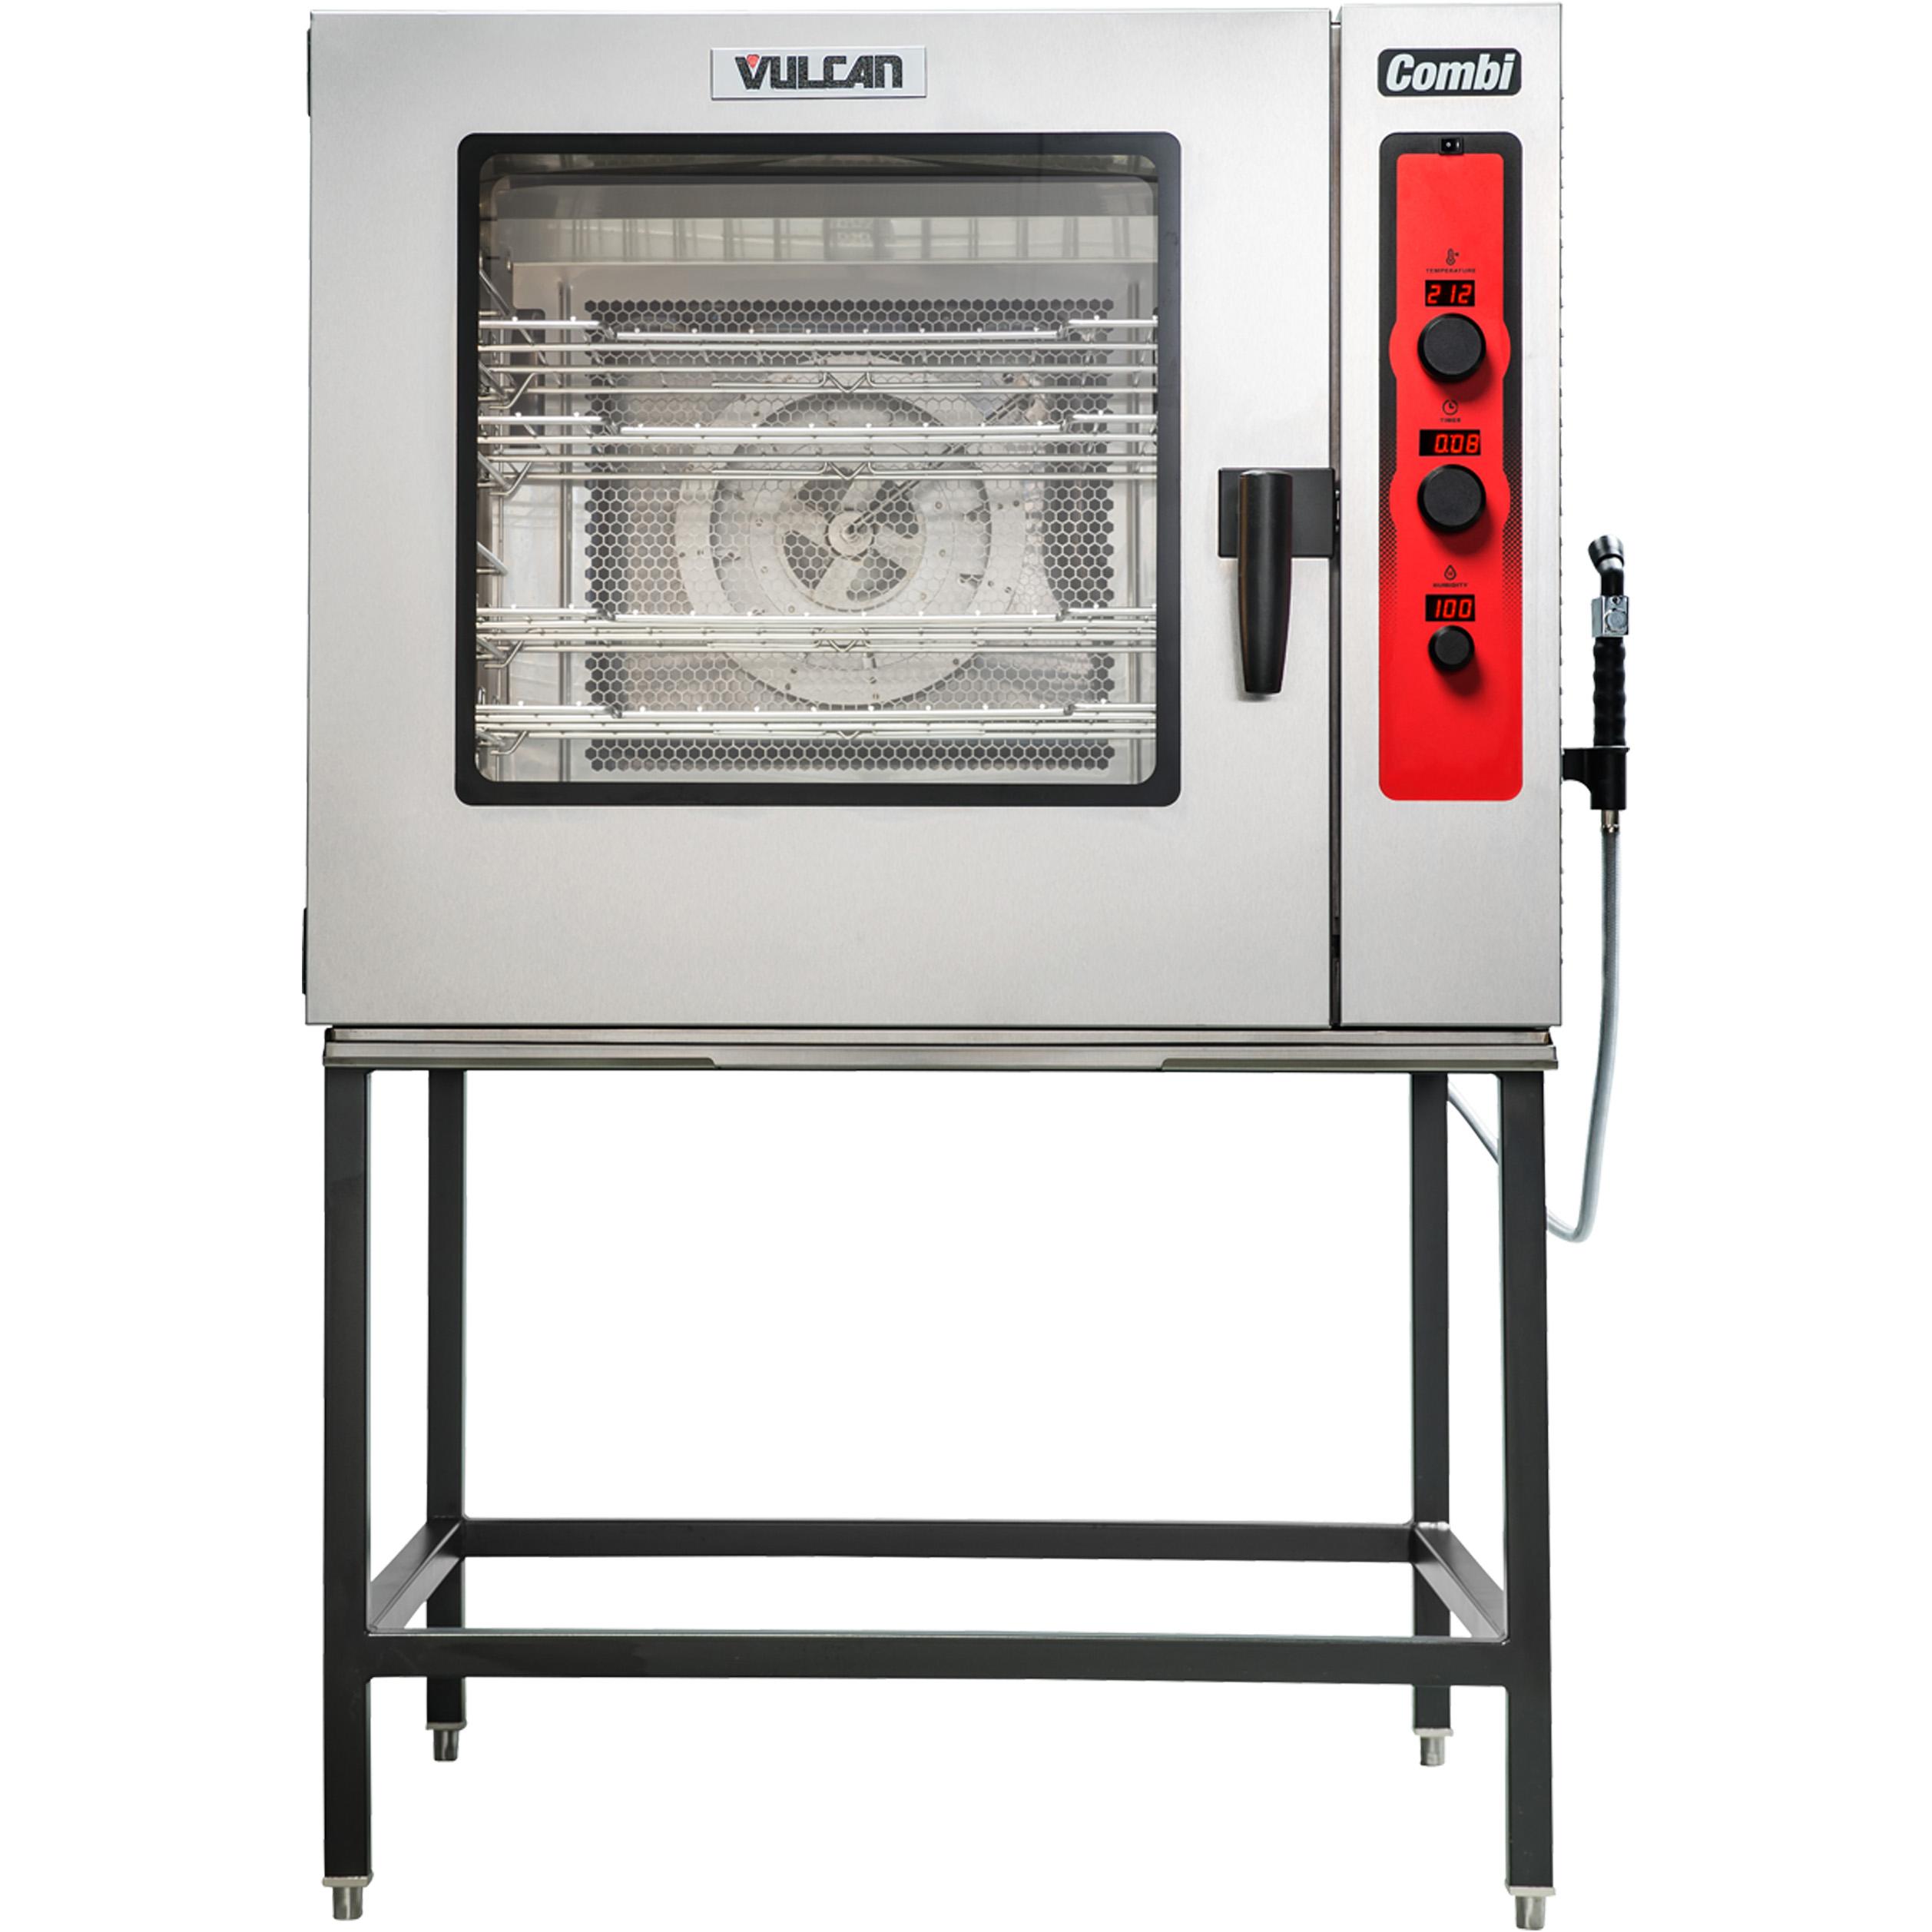 Vulcan ABC7G-NAT combi oven, gas